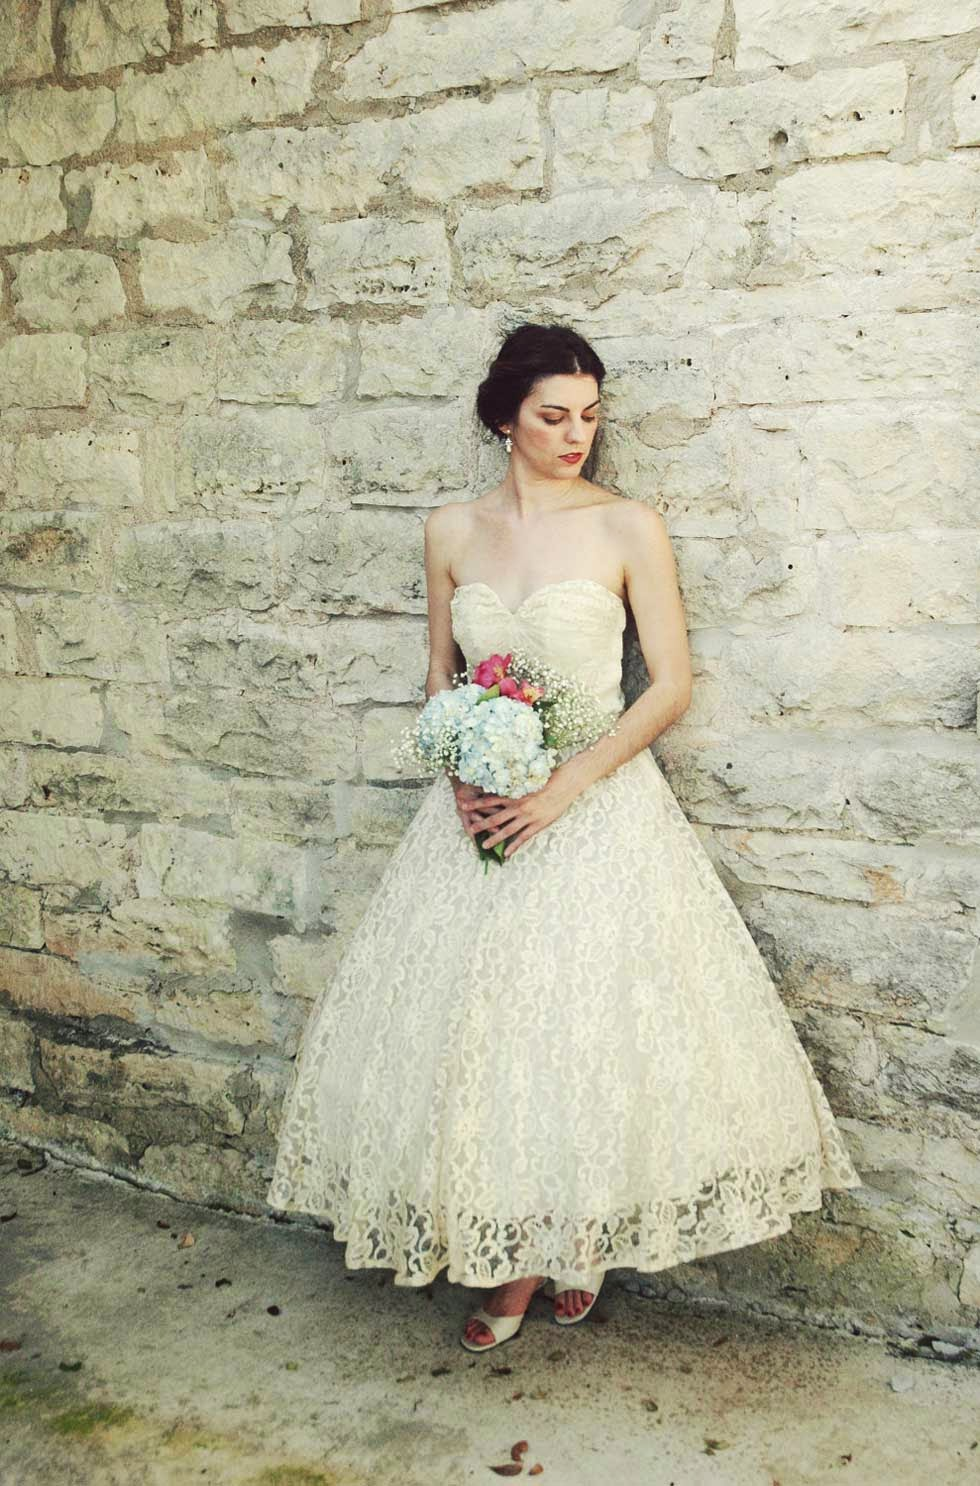 Bride pics tumblr